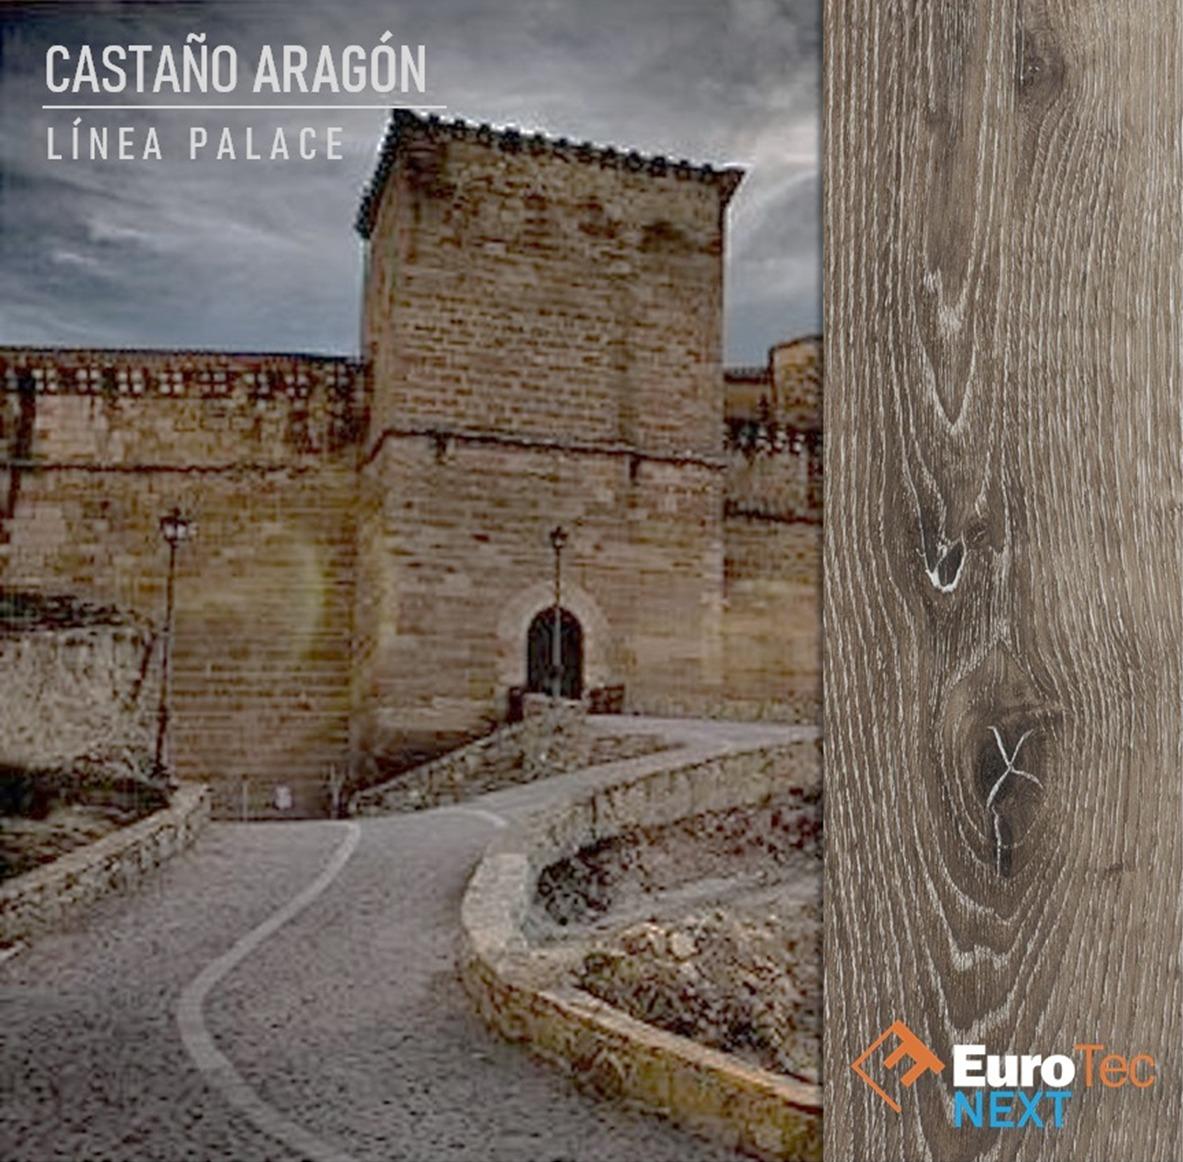 Castaño Aragón paleta de colores pisos - fábrica de aberturas de PVC QCERO.COM.AR